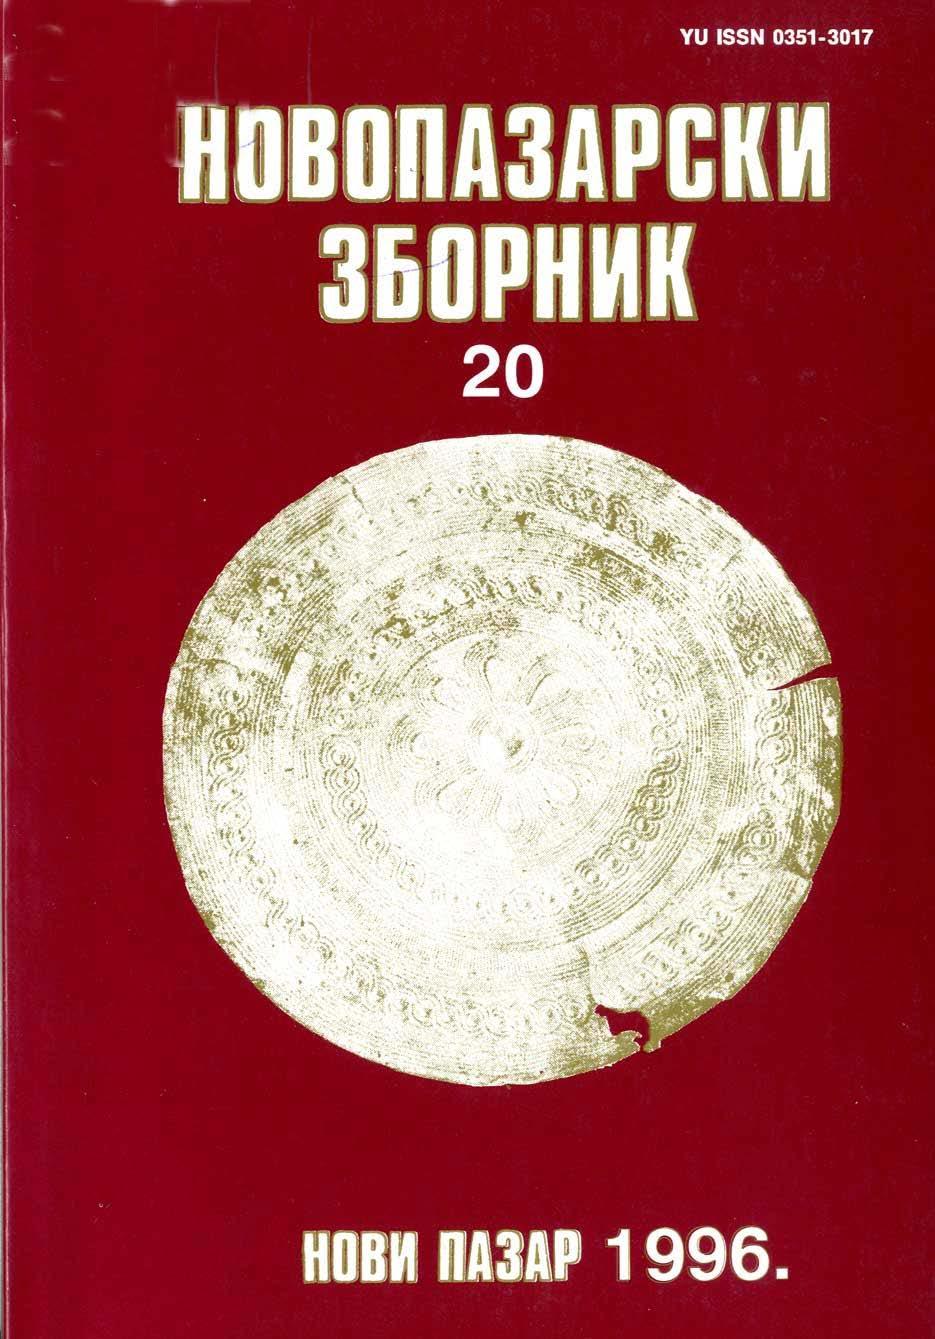 BROJ 20